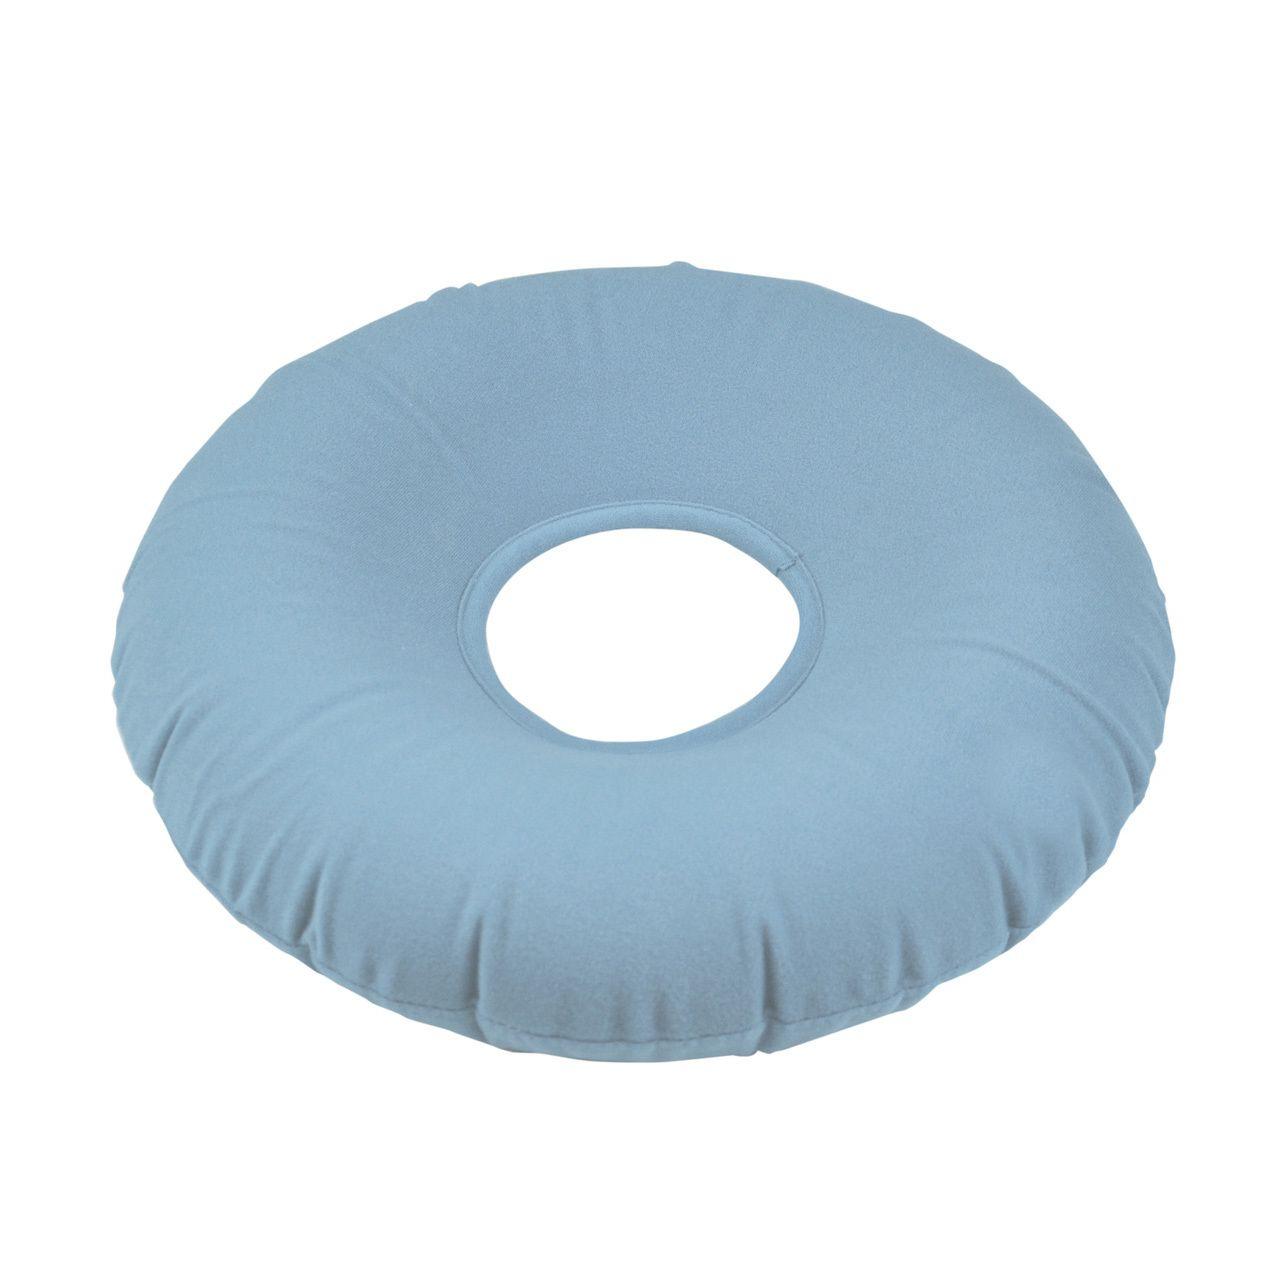 Donut zitring zitkussen ERKAZITR01 0000 Donut Zitring Zitkussen